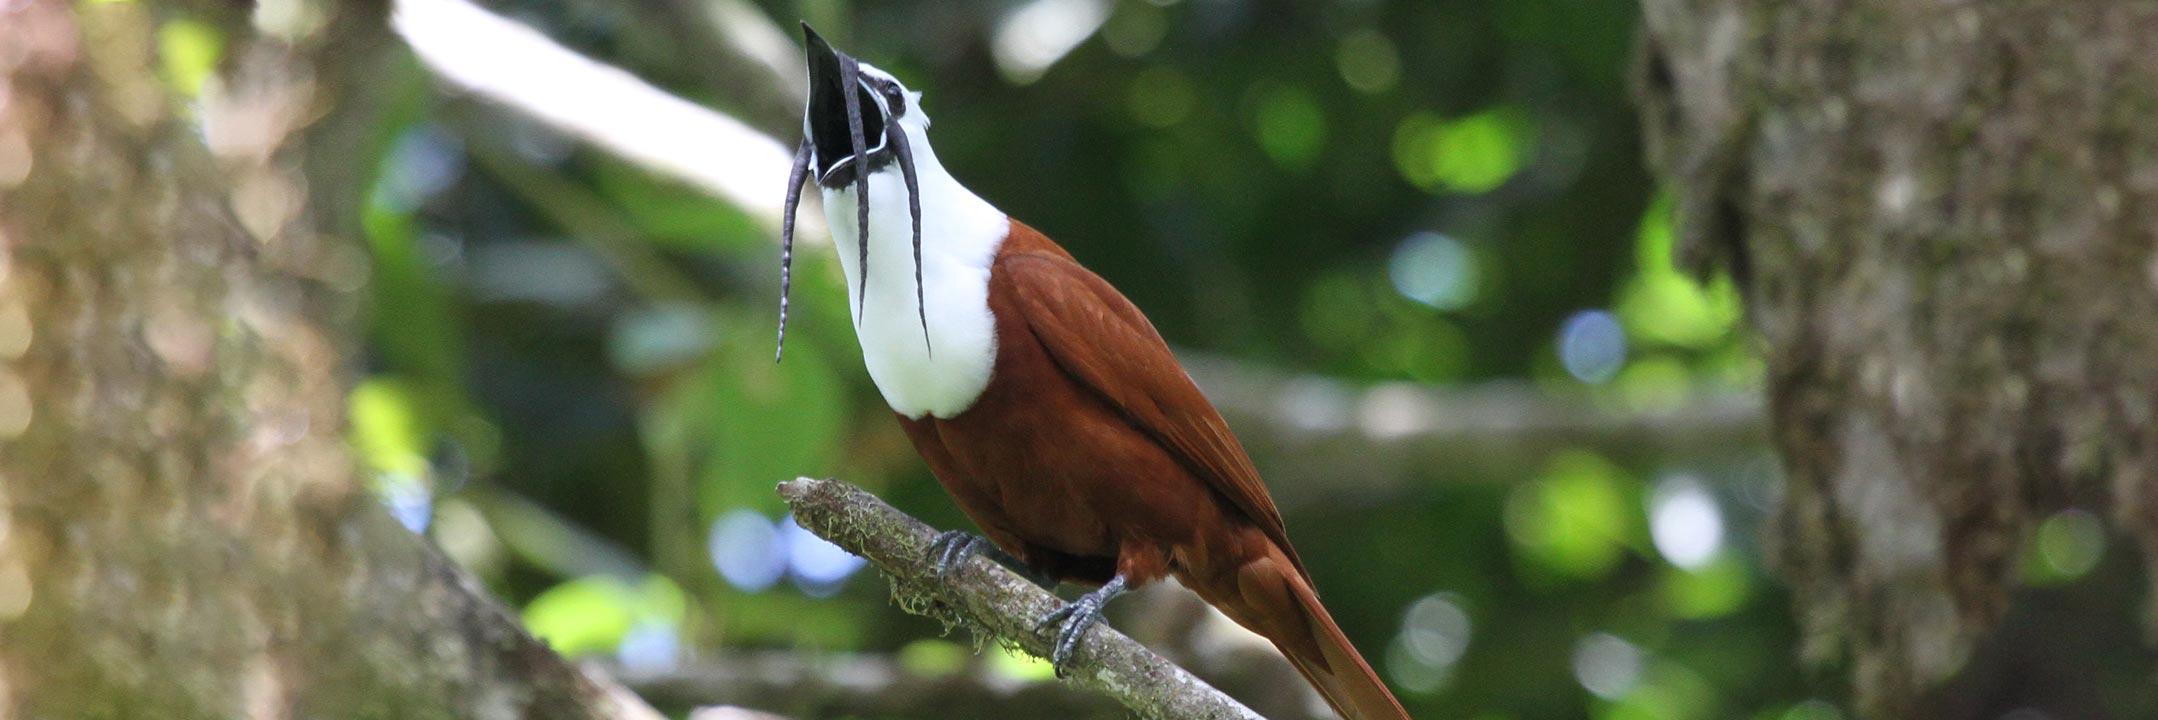 birds10